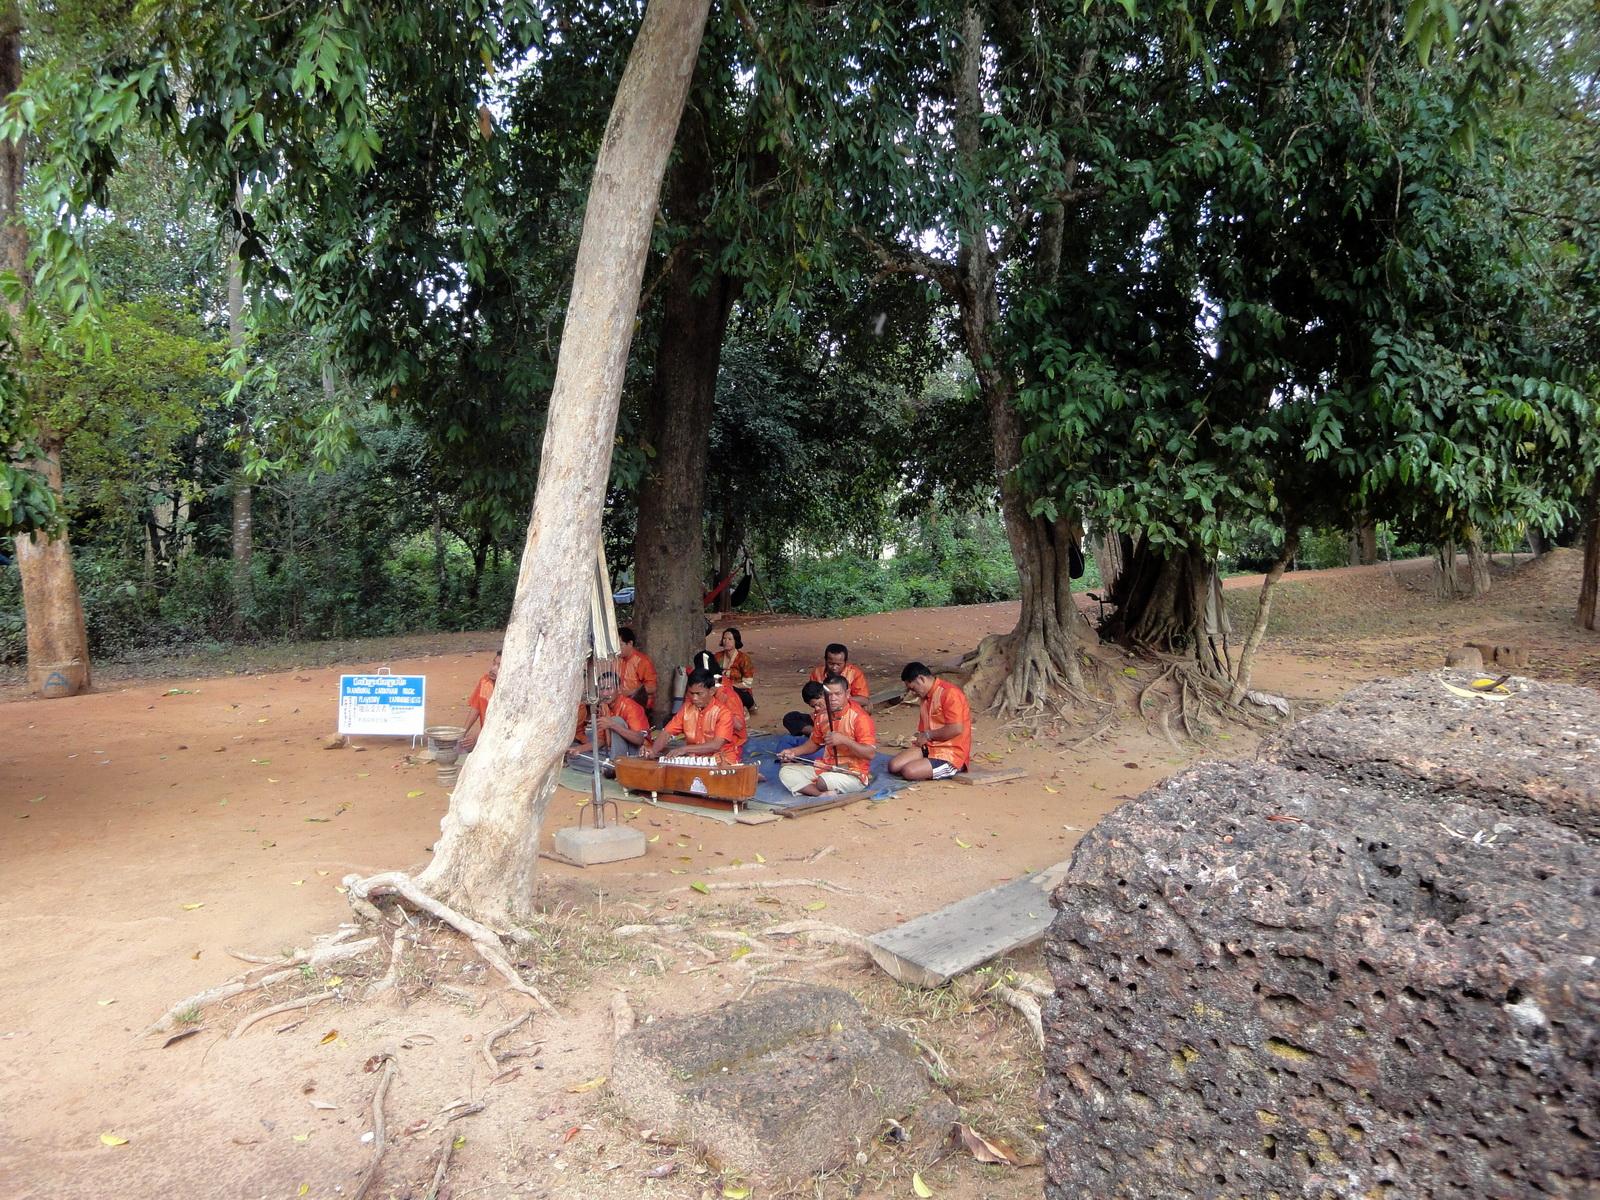 Banteay Srei Temple band raising money for landmine victims 01